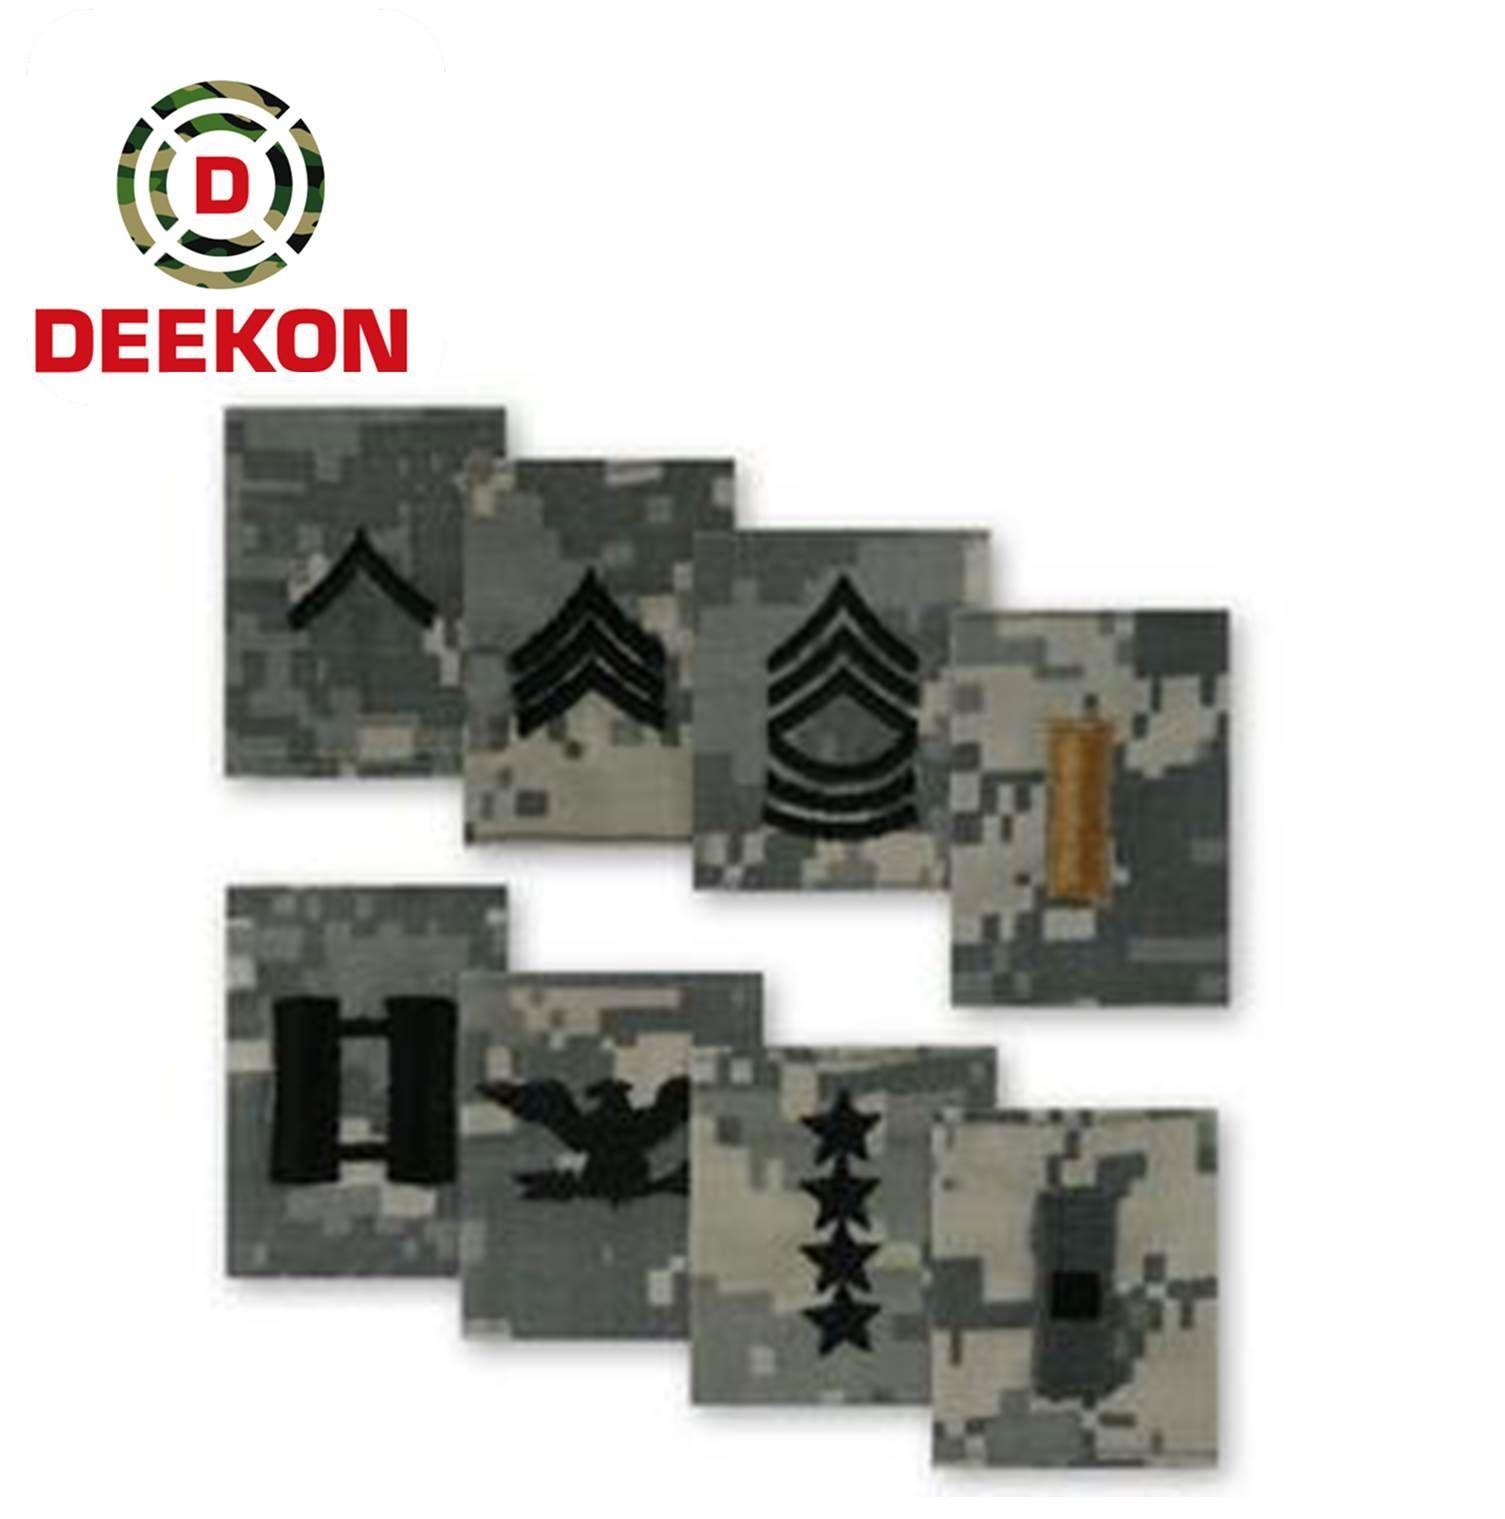 https://www.deekongroup.com/upfile/2018/06/18/20180618213841_752.jpg